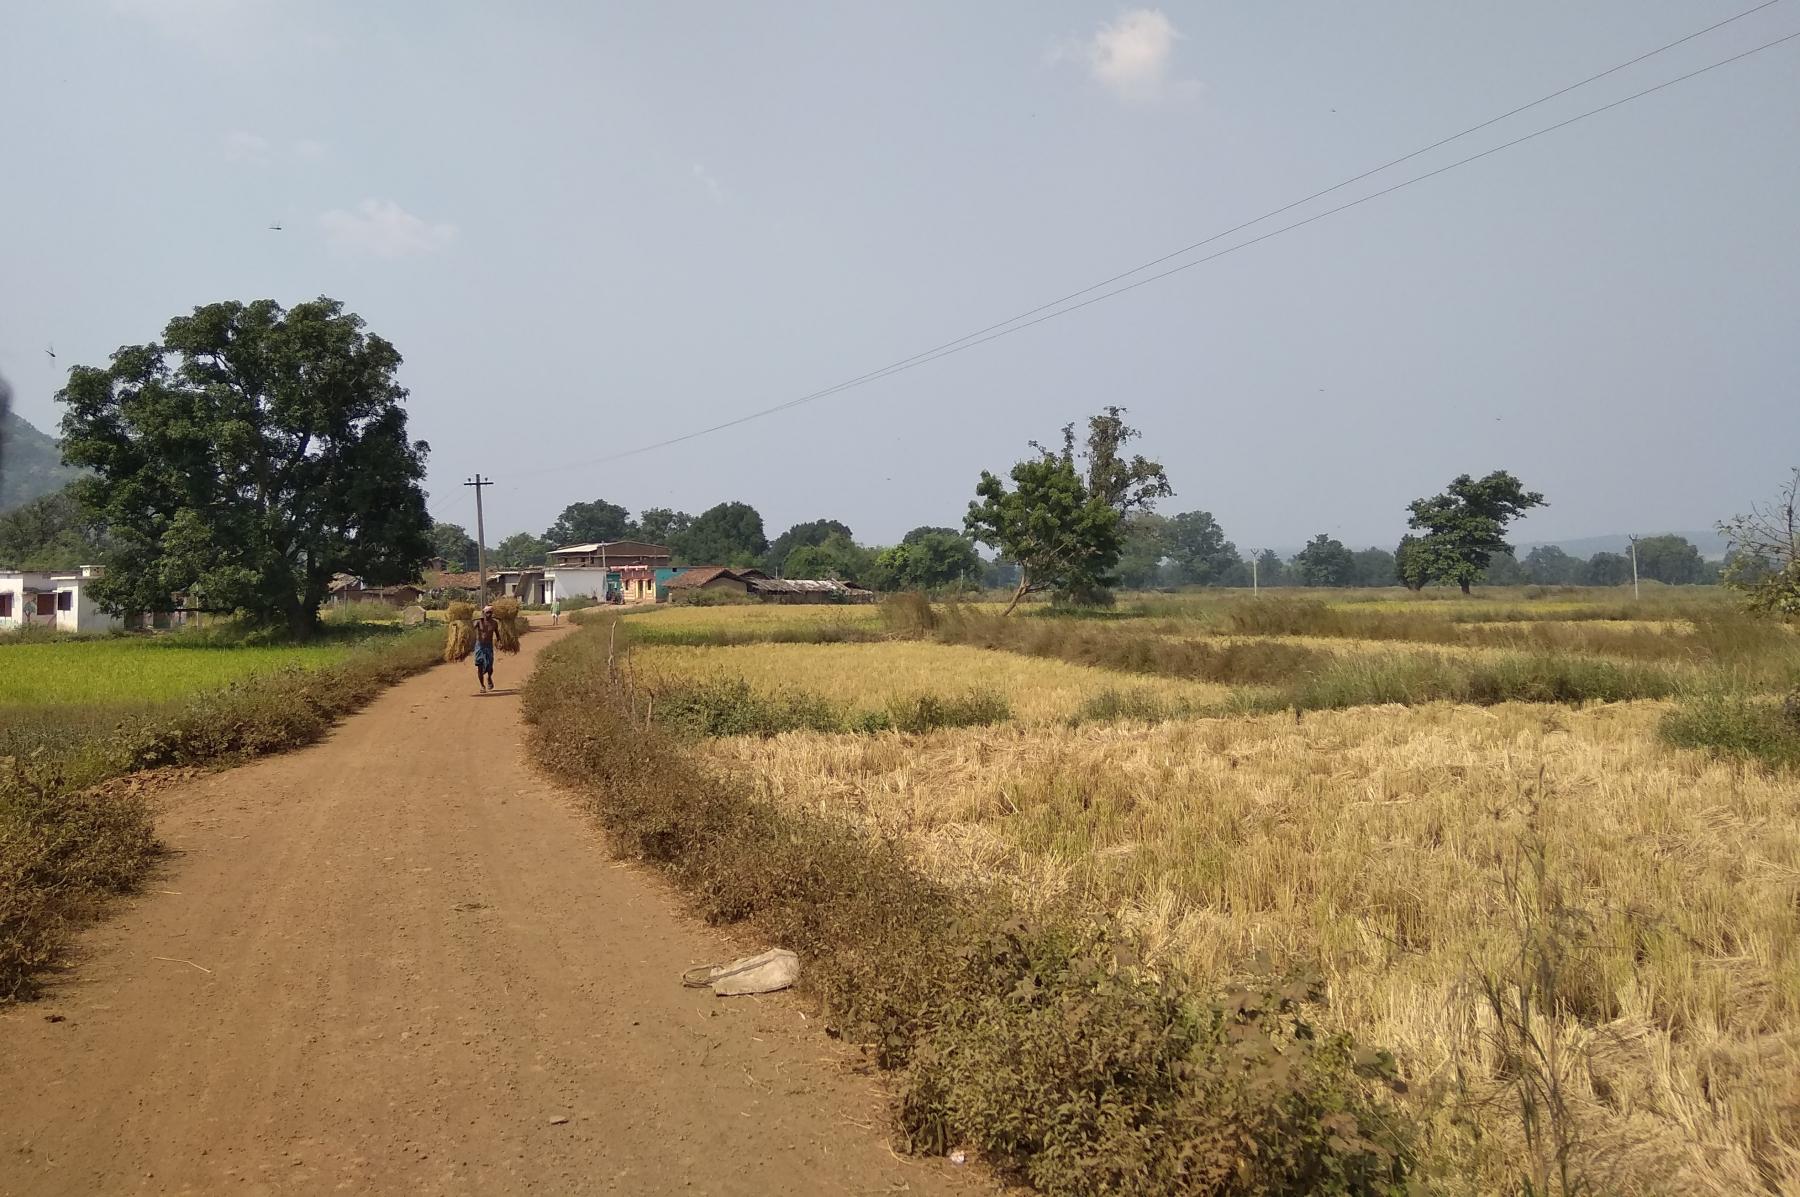 Paddy fields around one of the village in Nuapada Block